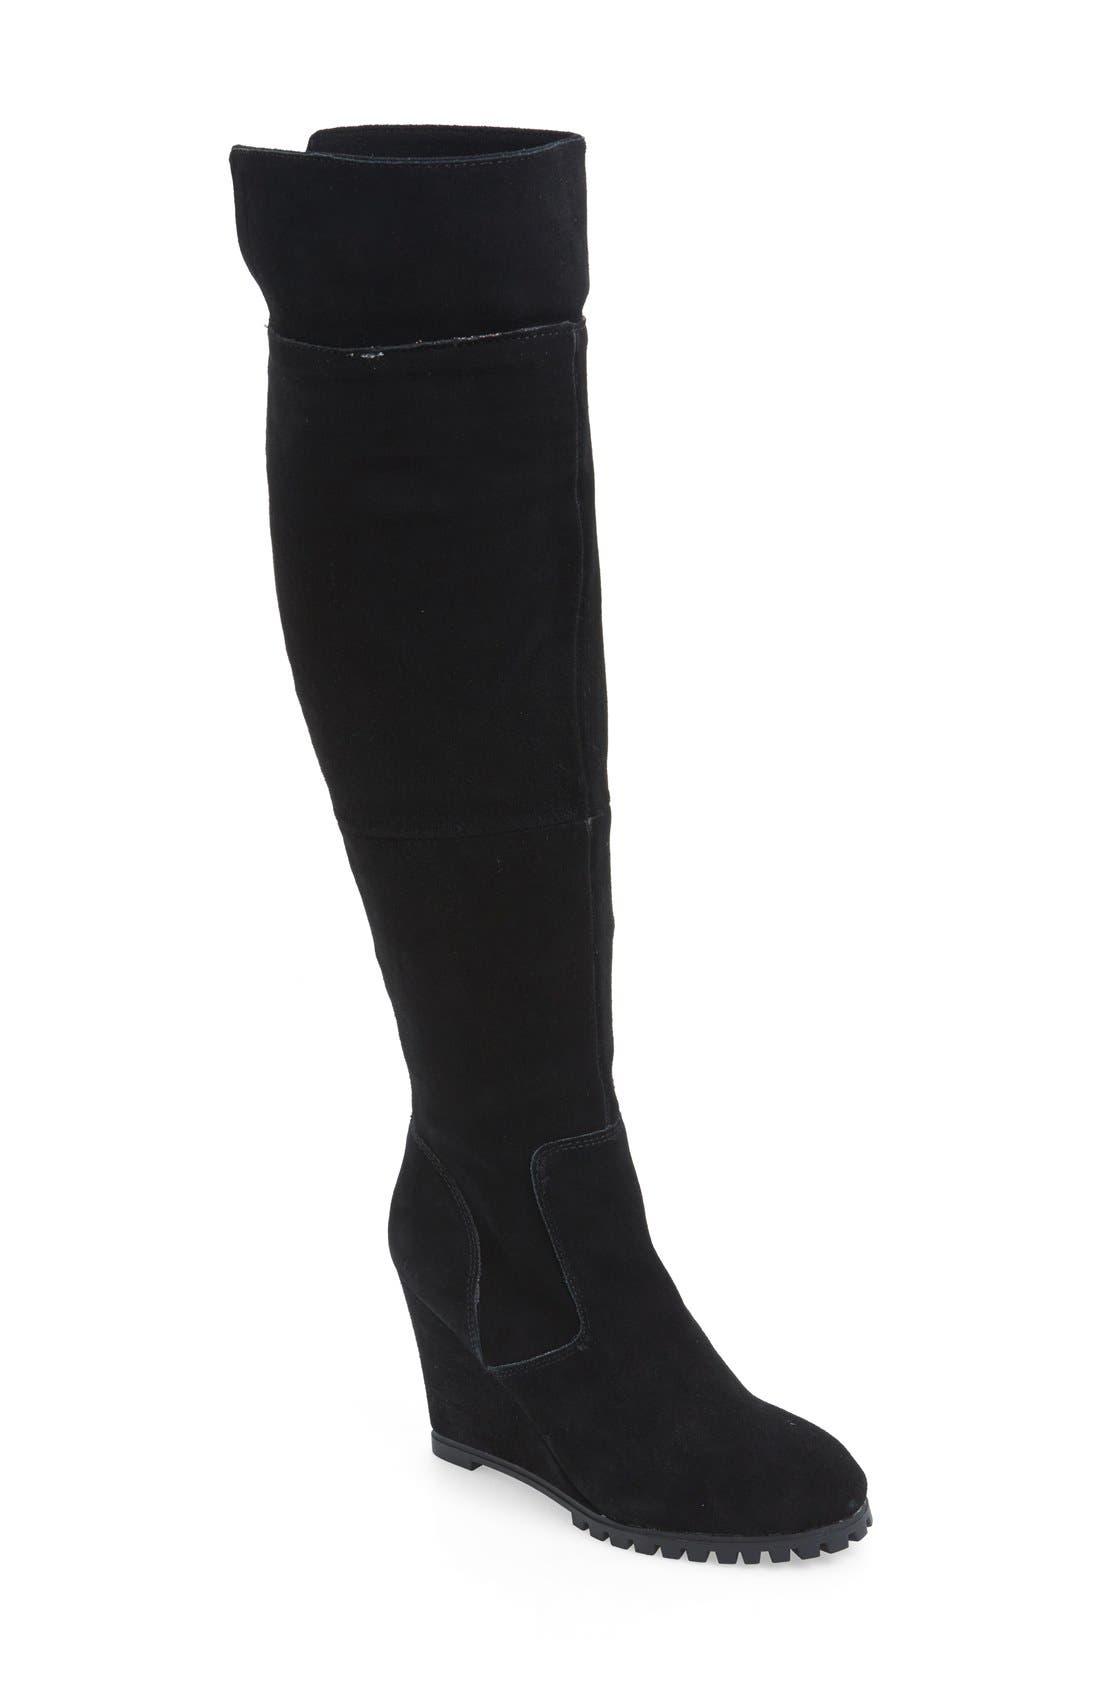 Main Image - Steve Madden 'Willful' Tall Wedge Boot (Women)